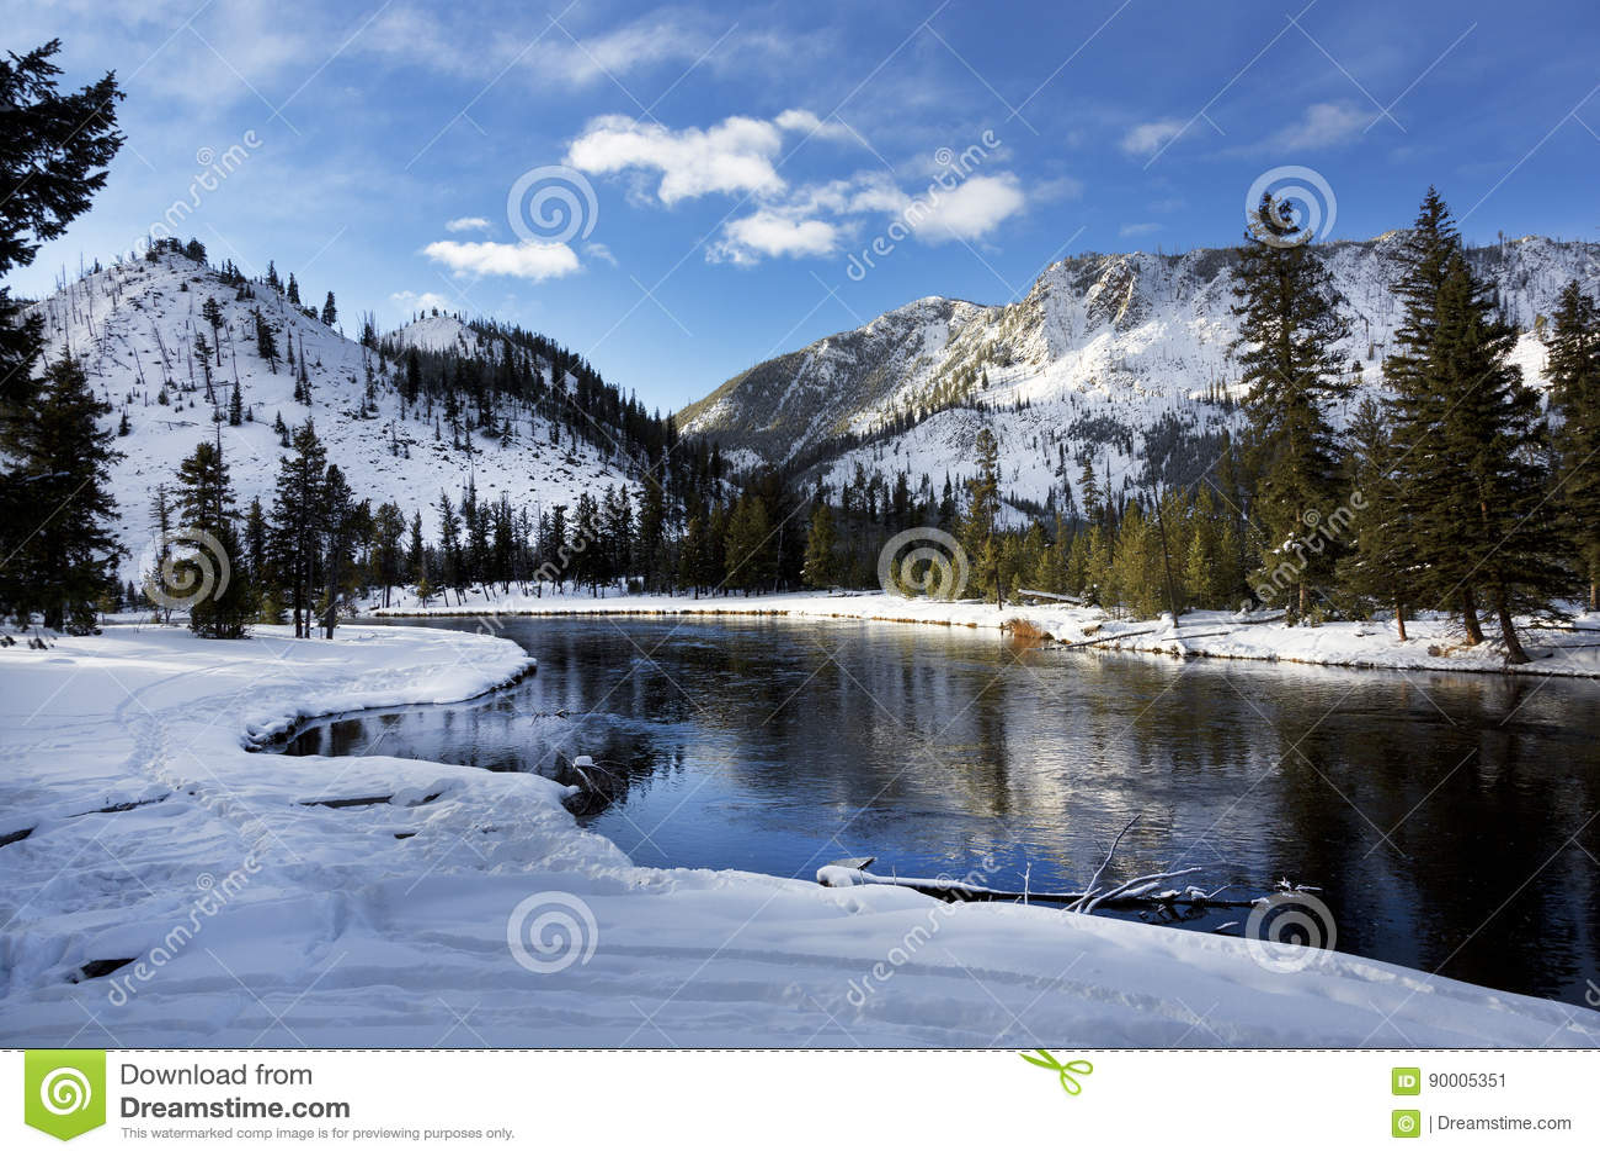 Yellowstone River, Winter, Yellowstone National Park